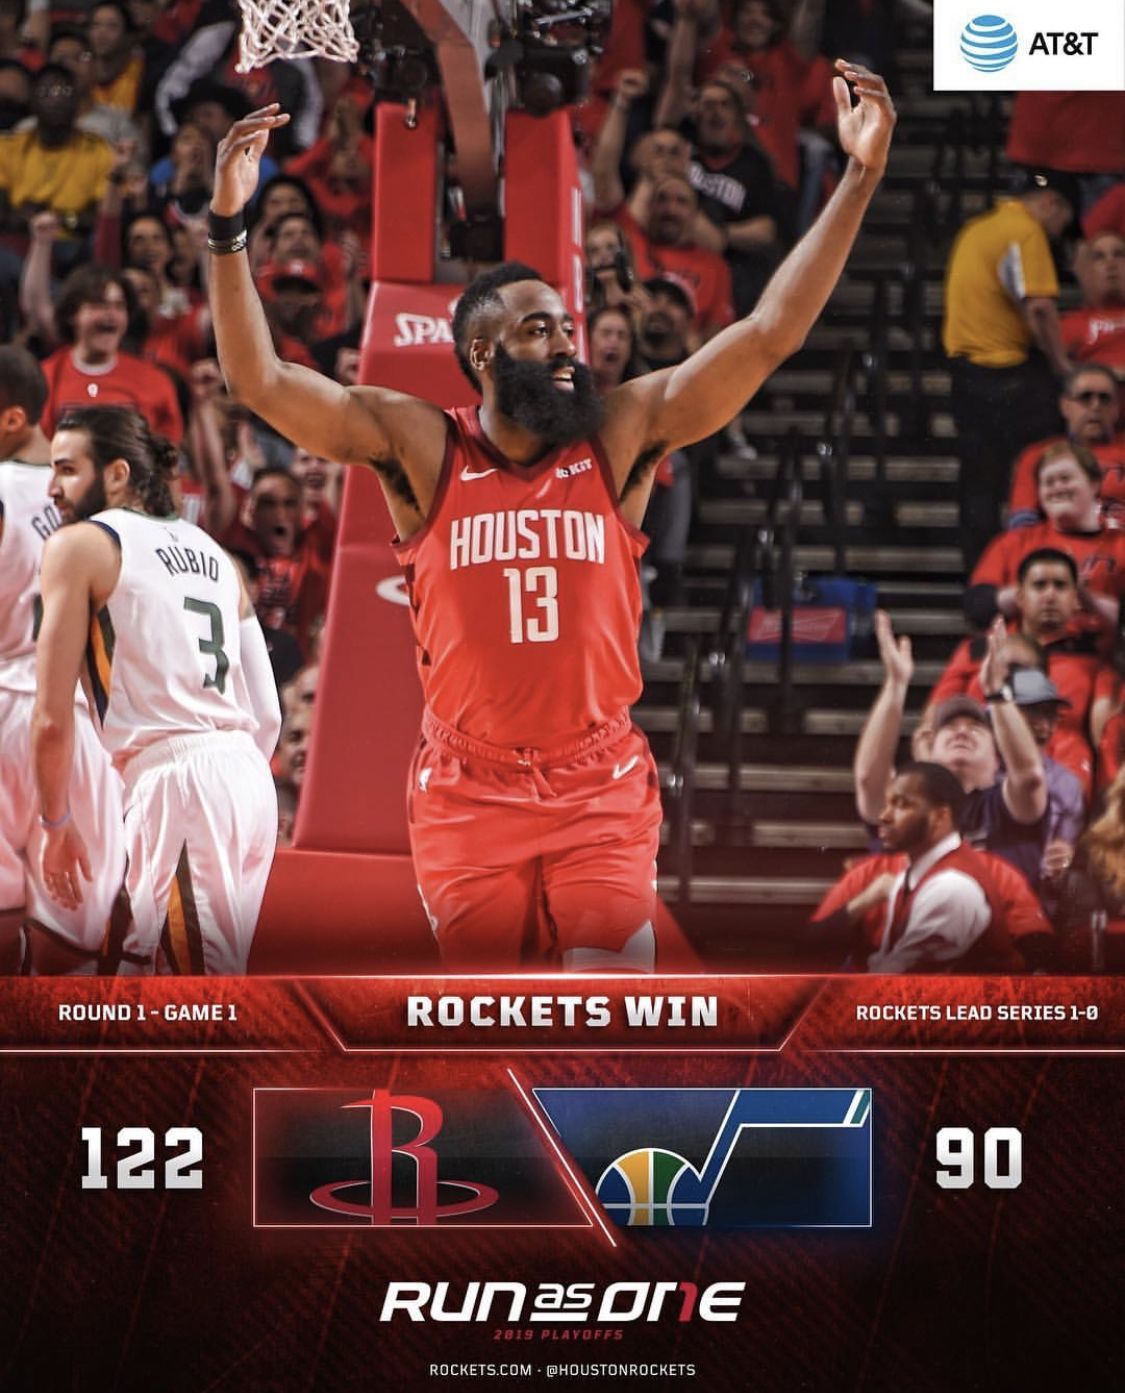 Rockets 10 James harden, Spa, Rocket